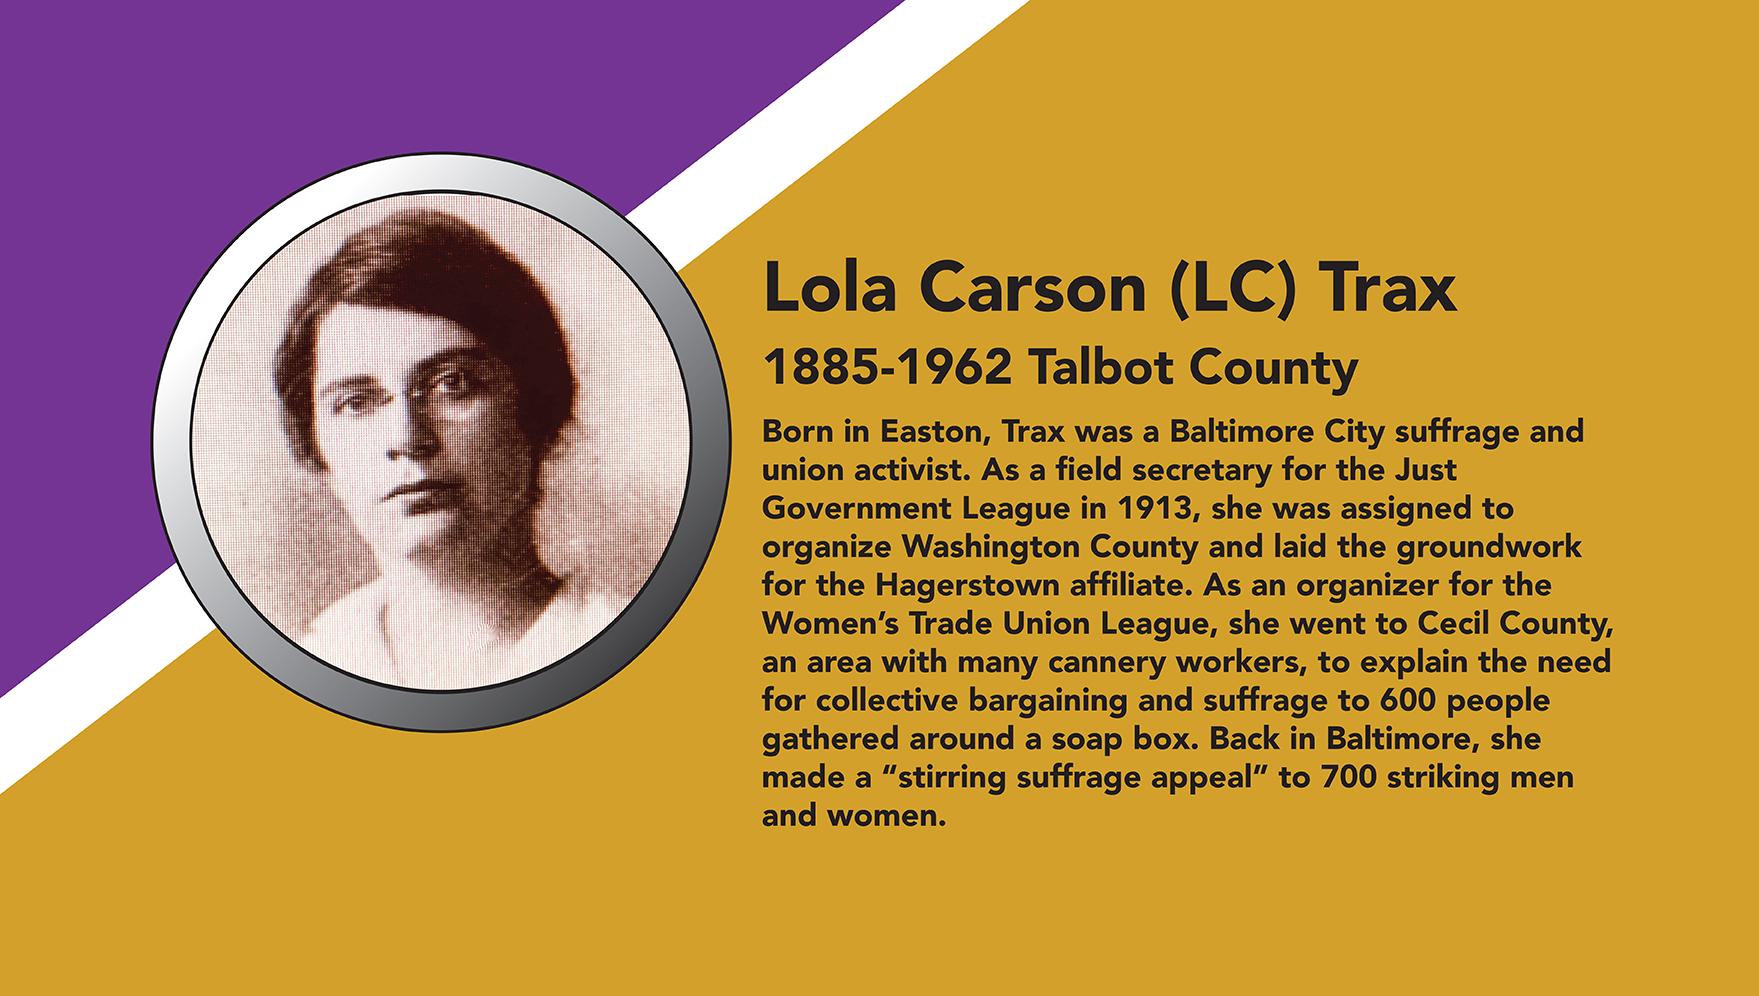 Lola Carson Trax